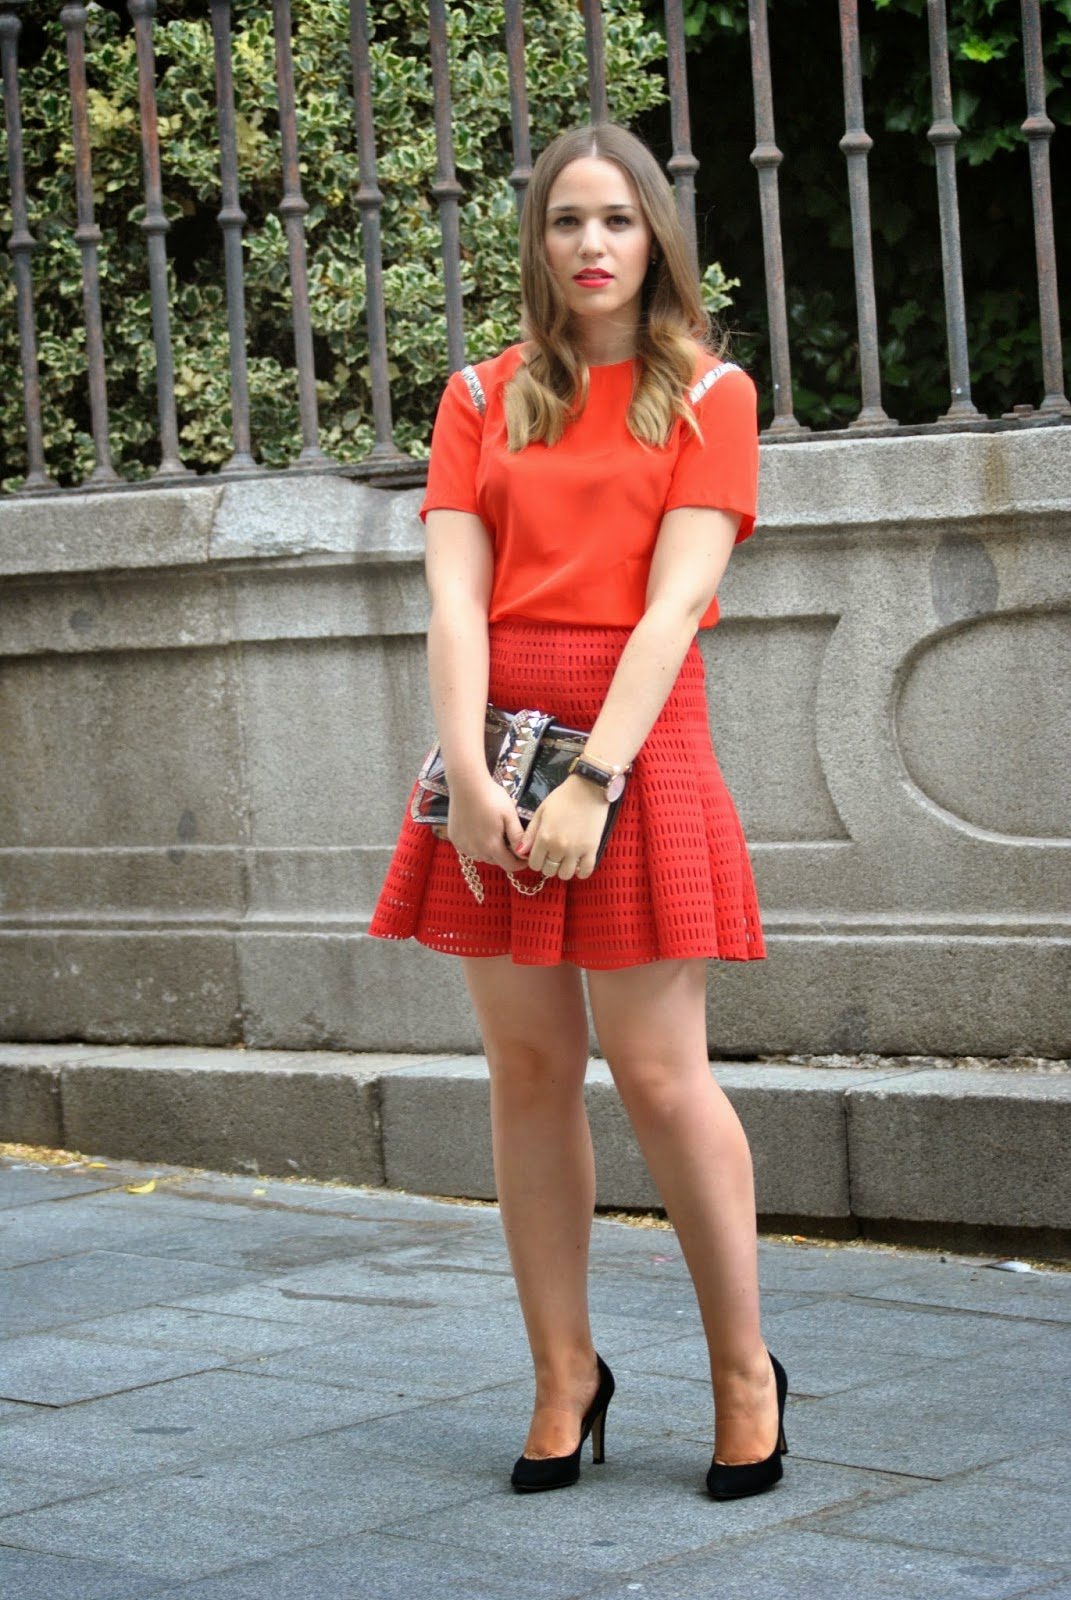 Glamour Street Fashion Show: Finalista!